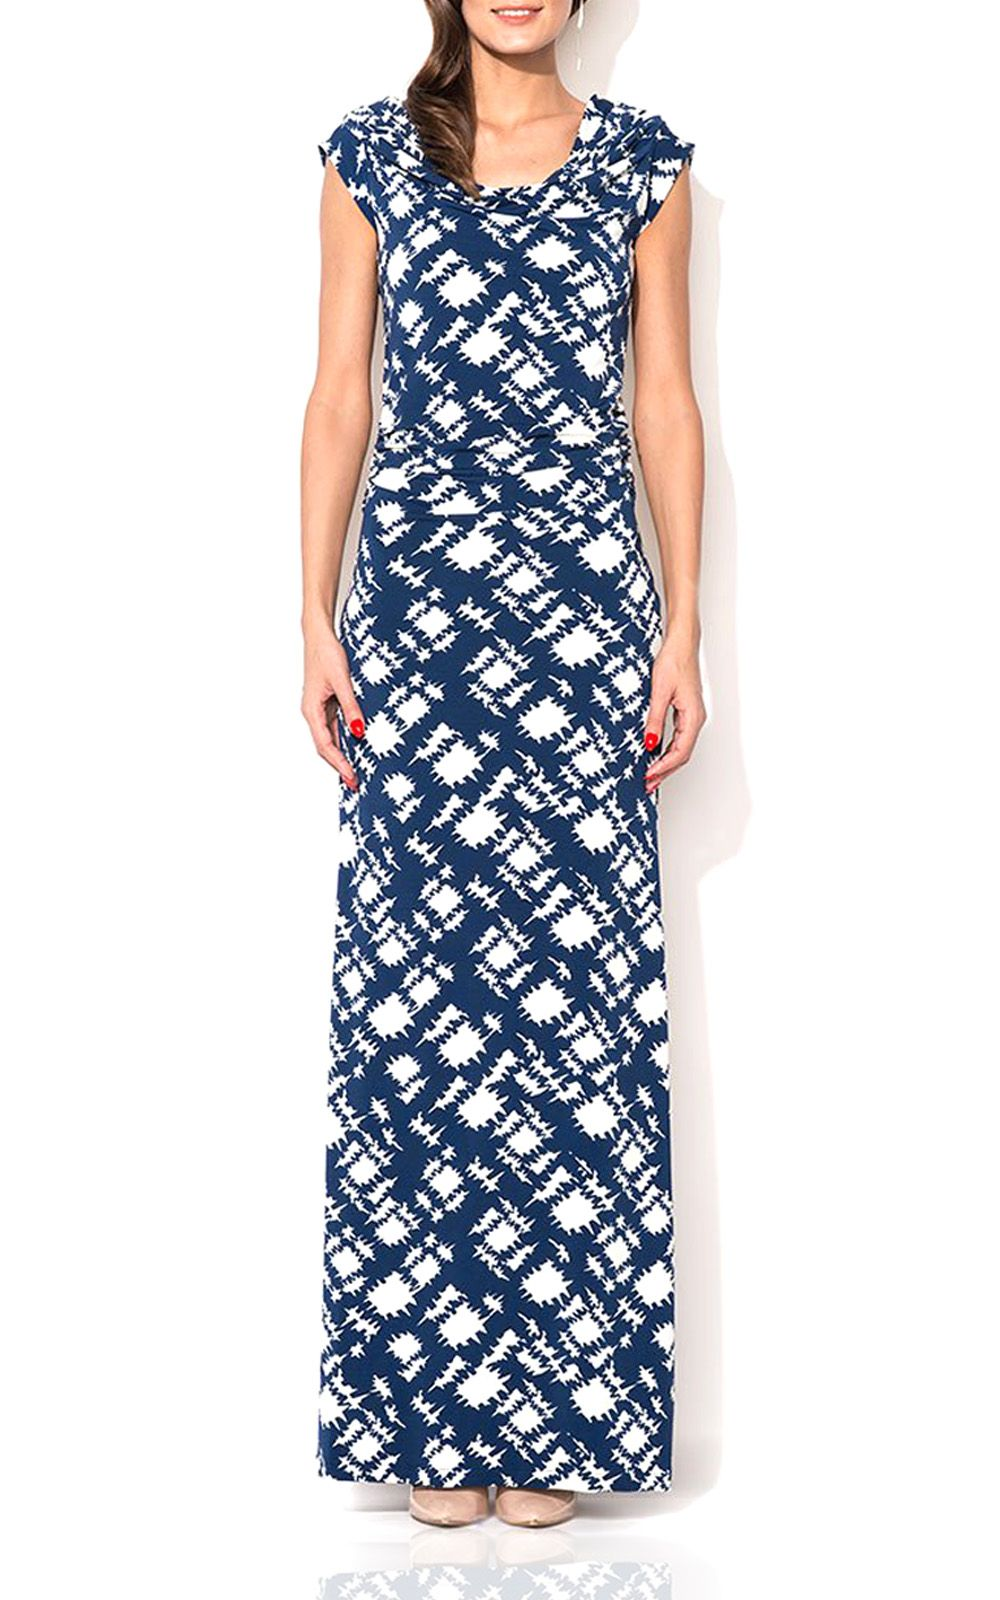 Blue print draped cowl neck long maxi dress the jersey dress